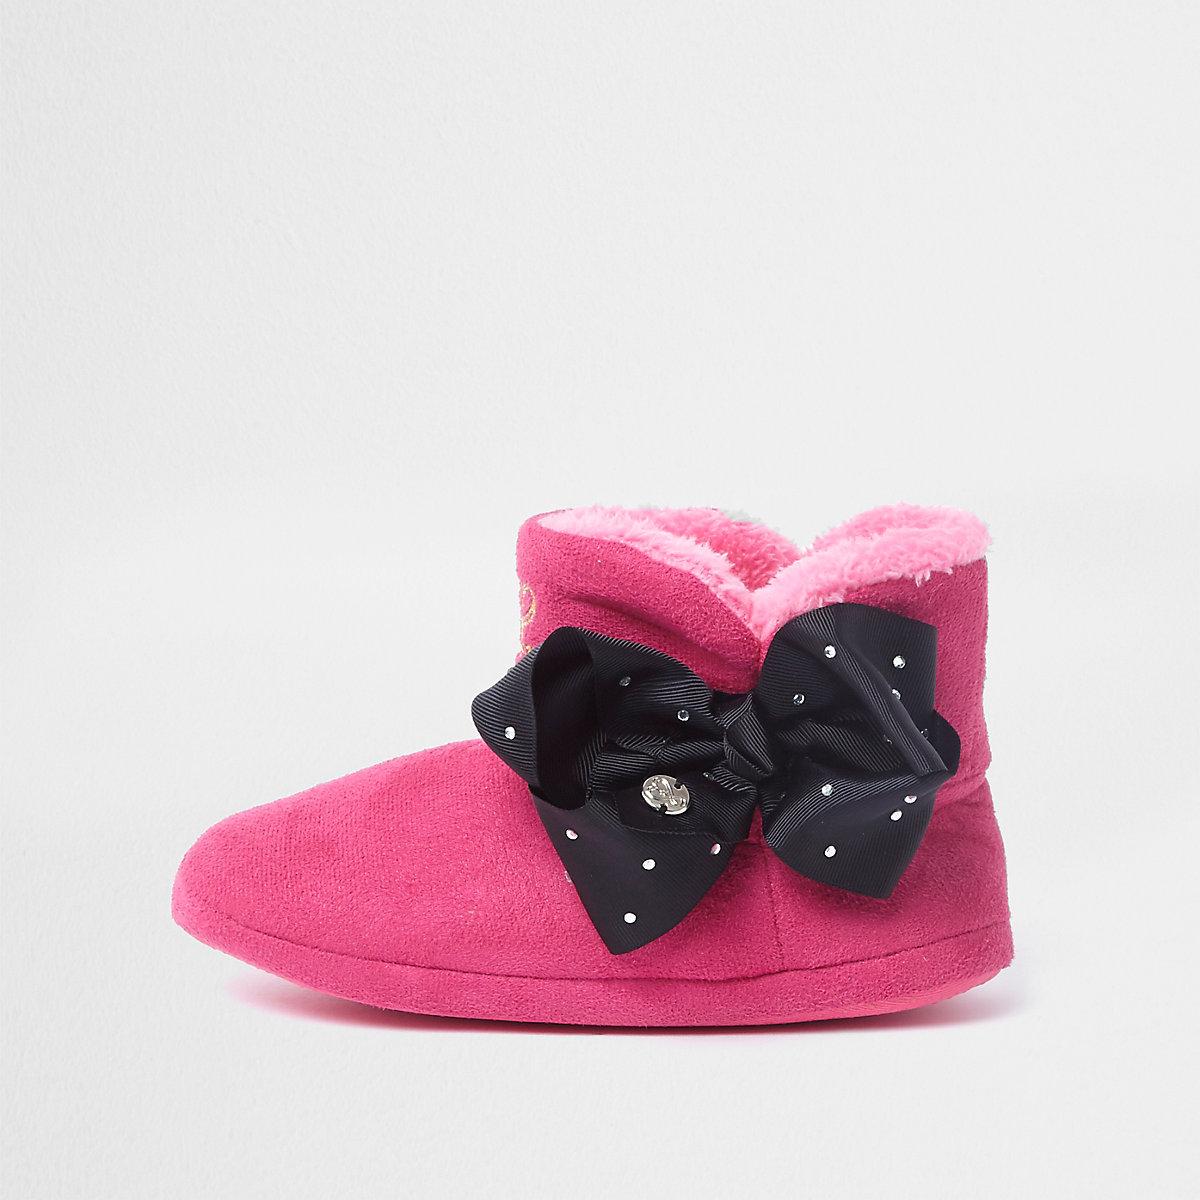 Girls pink JoJo Bows boot slippers